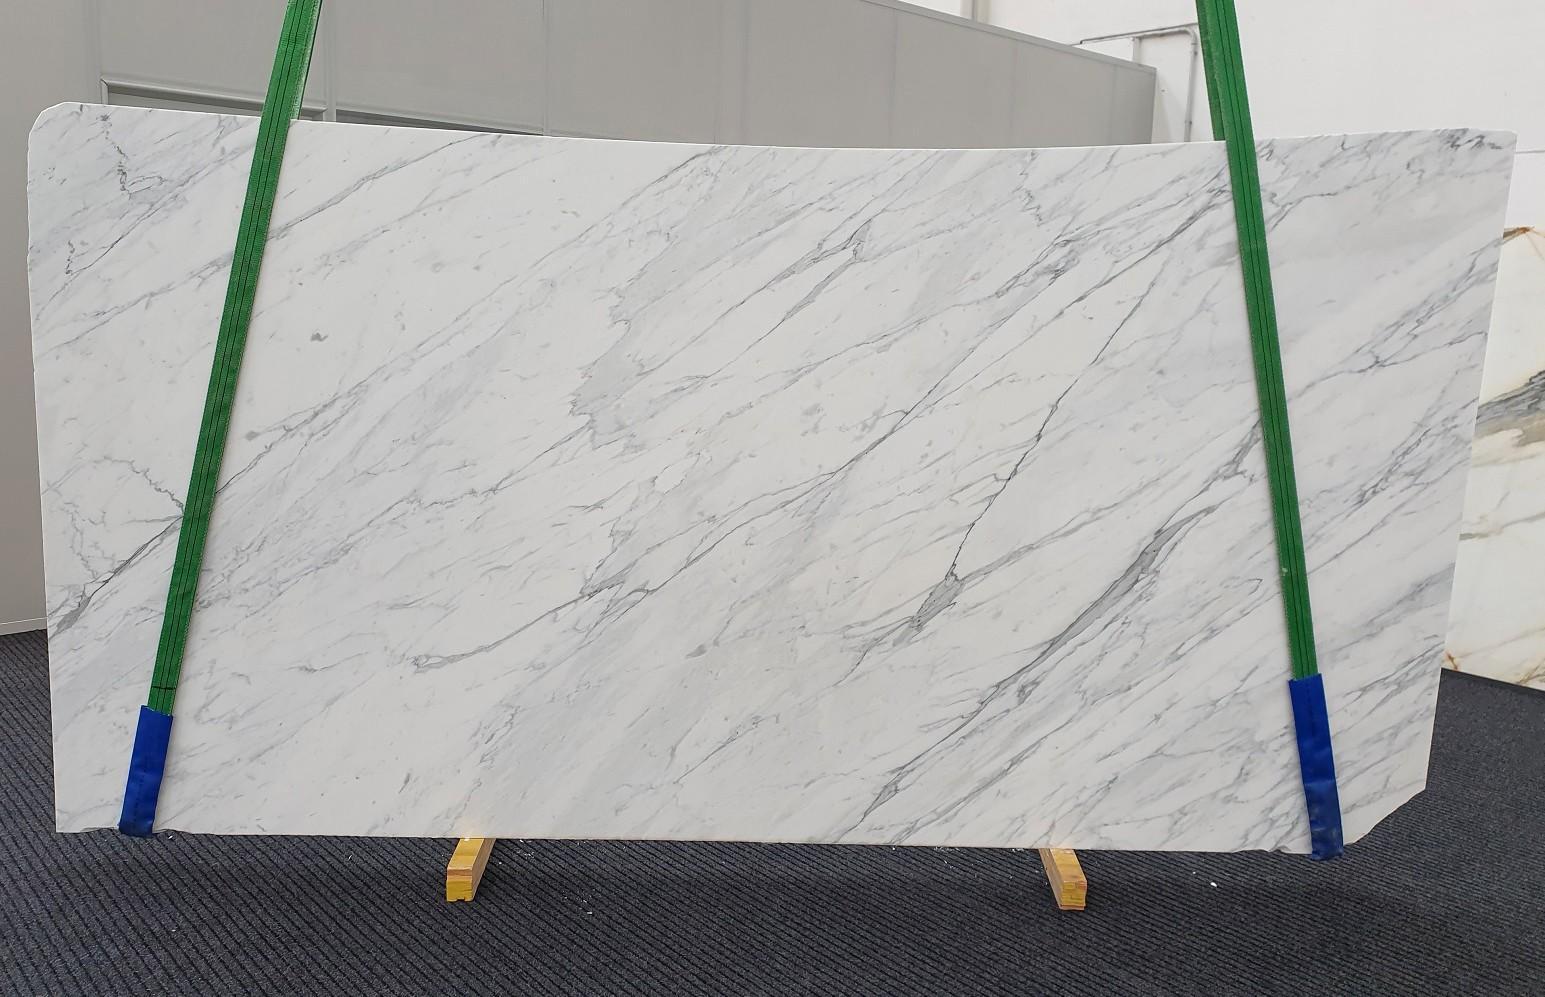 CALACATTA CARRARA Supply Veneto (Italy) honed slabs 1313 , Slab #51 natural marble